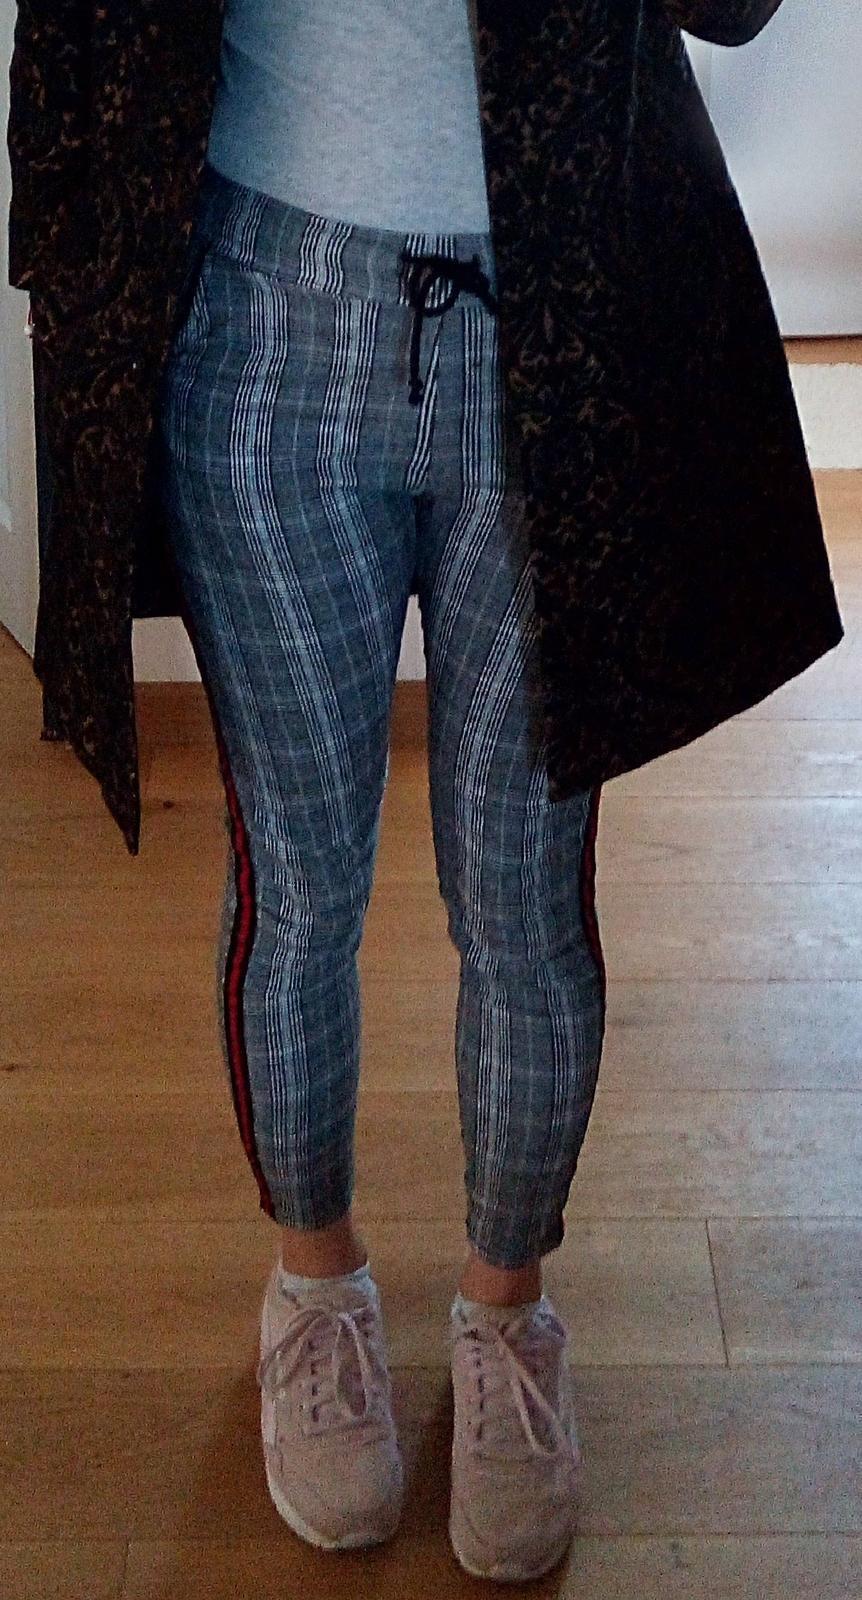 Kárované nohavice S - Obrázok č. 1